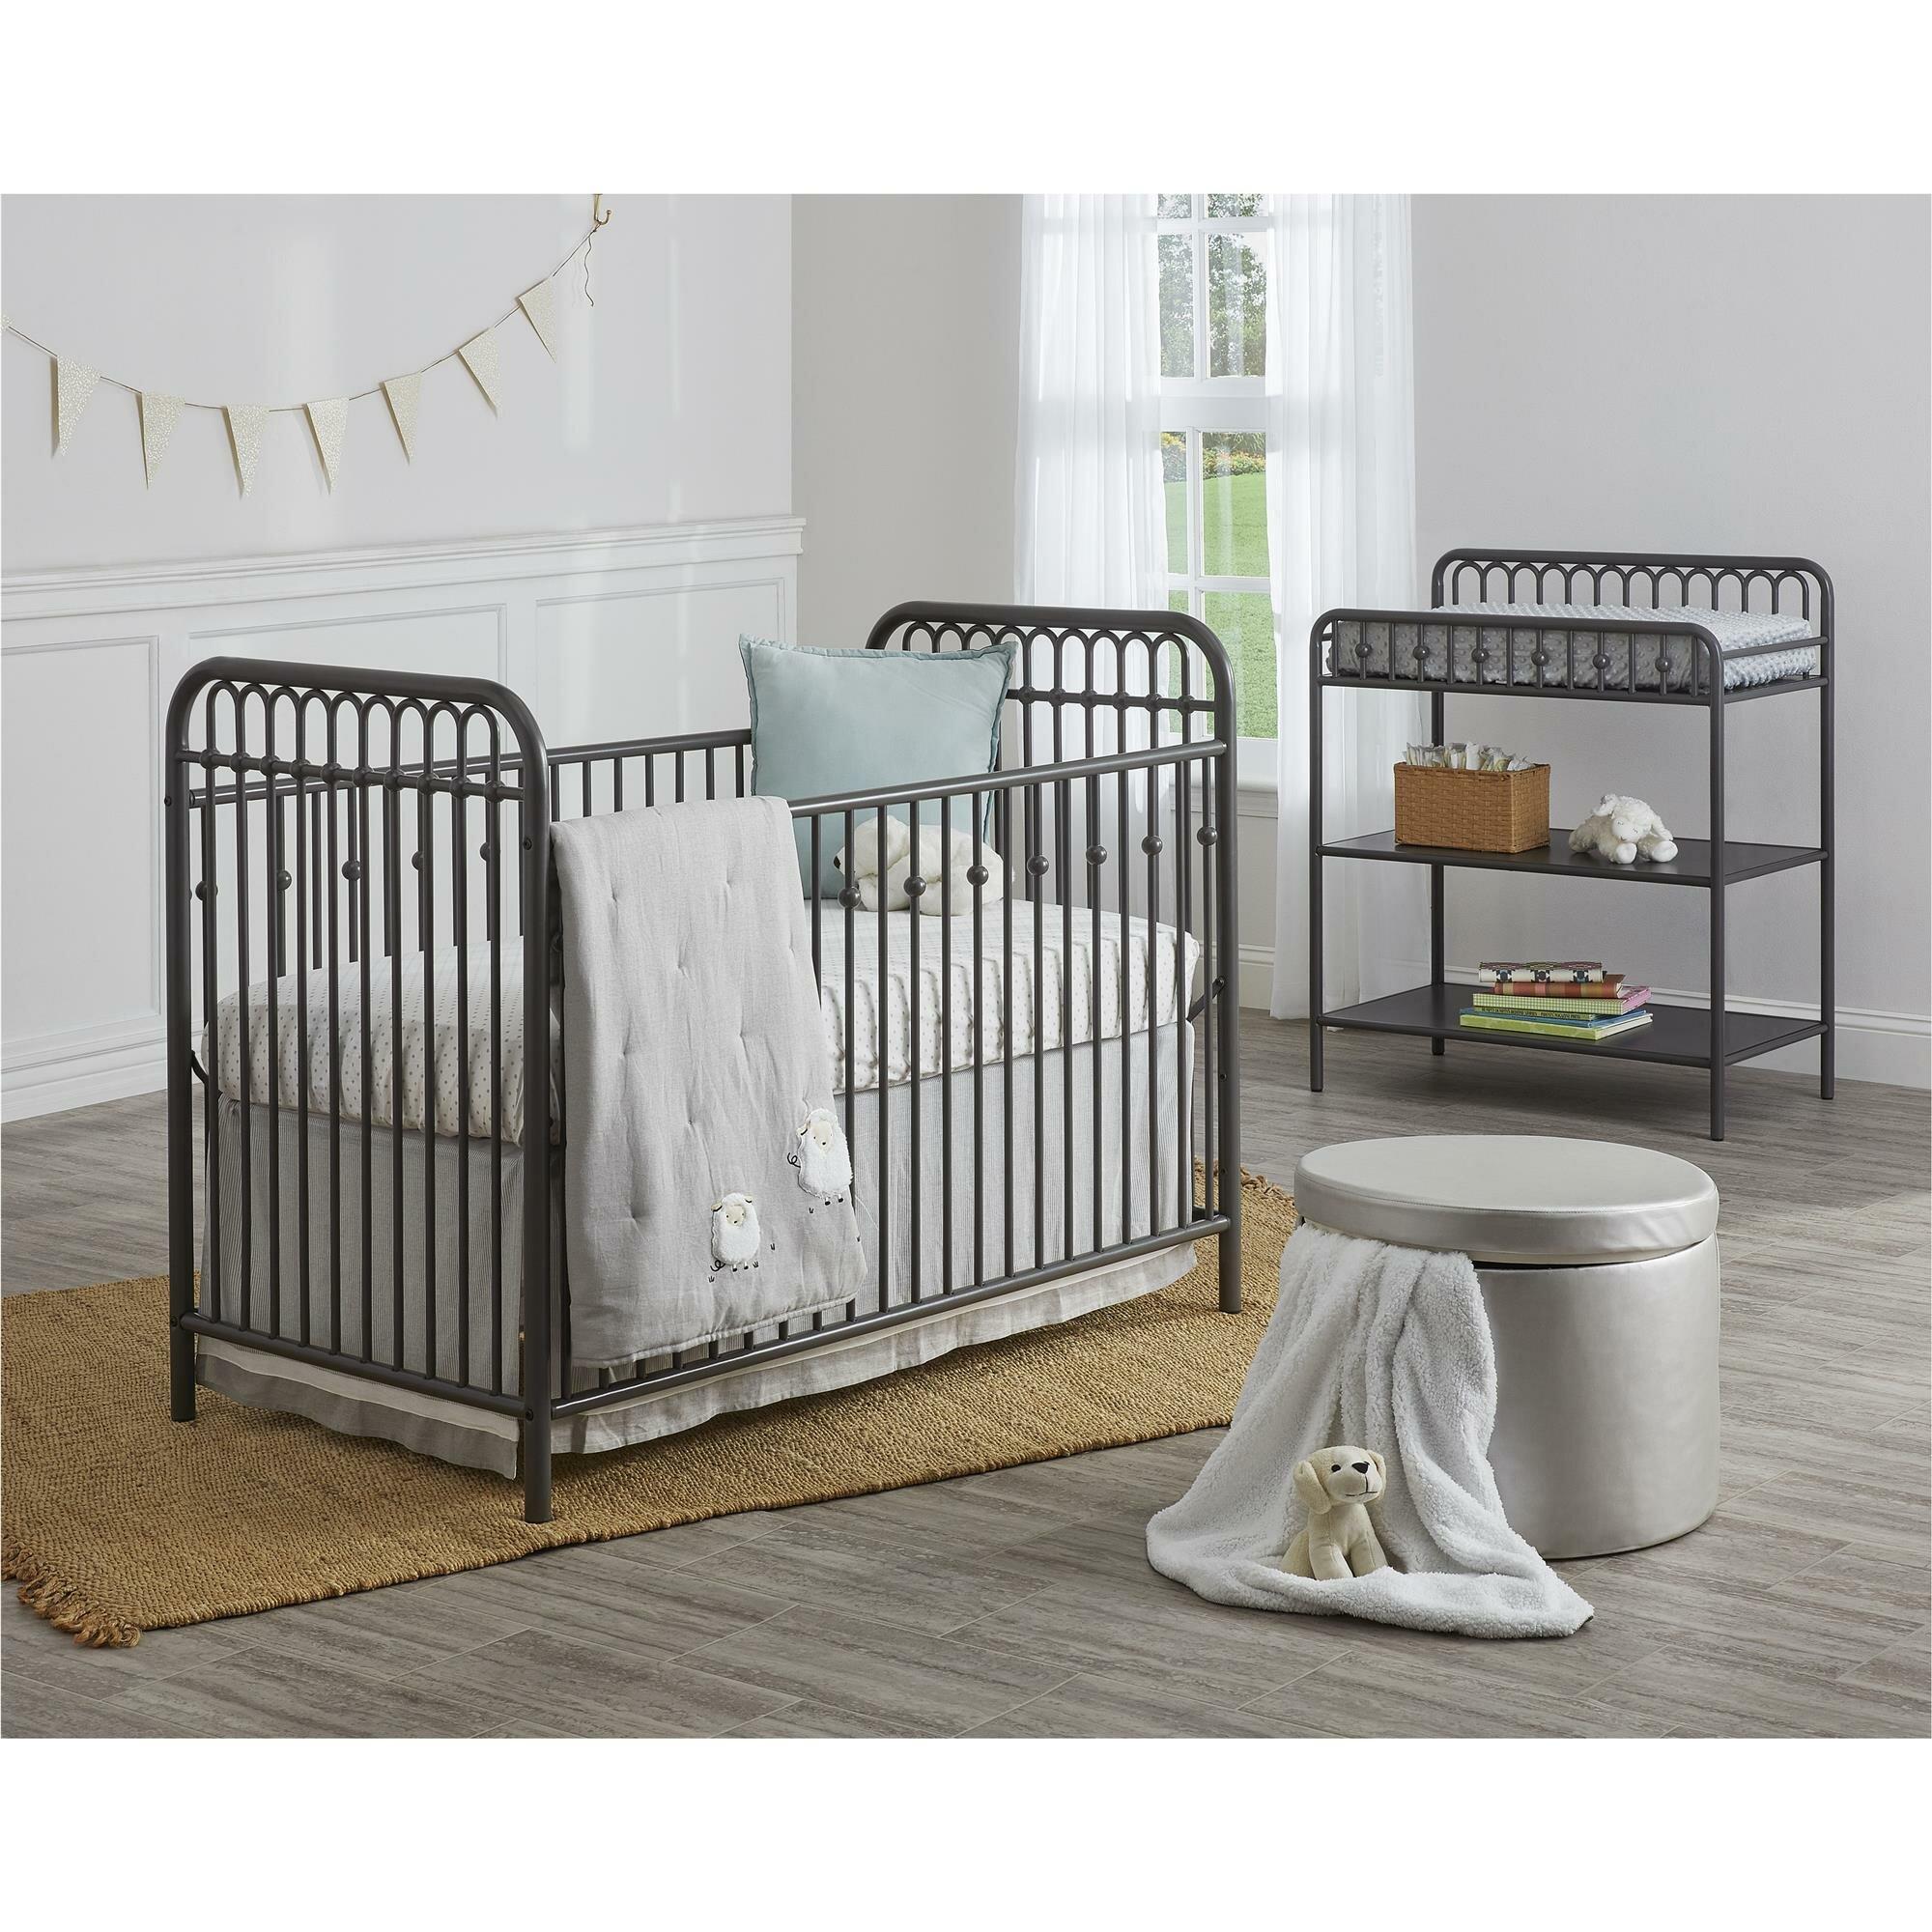 Monarch Hill Standard 2 Piece Nursery Furniture Set